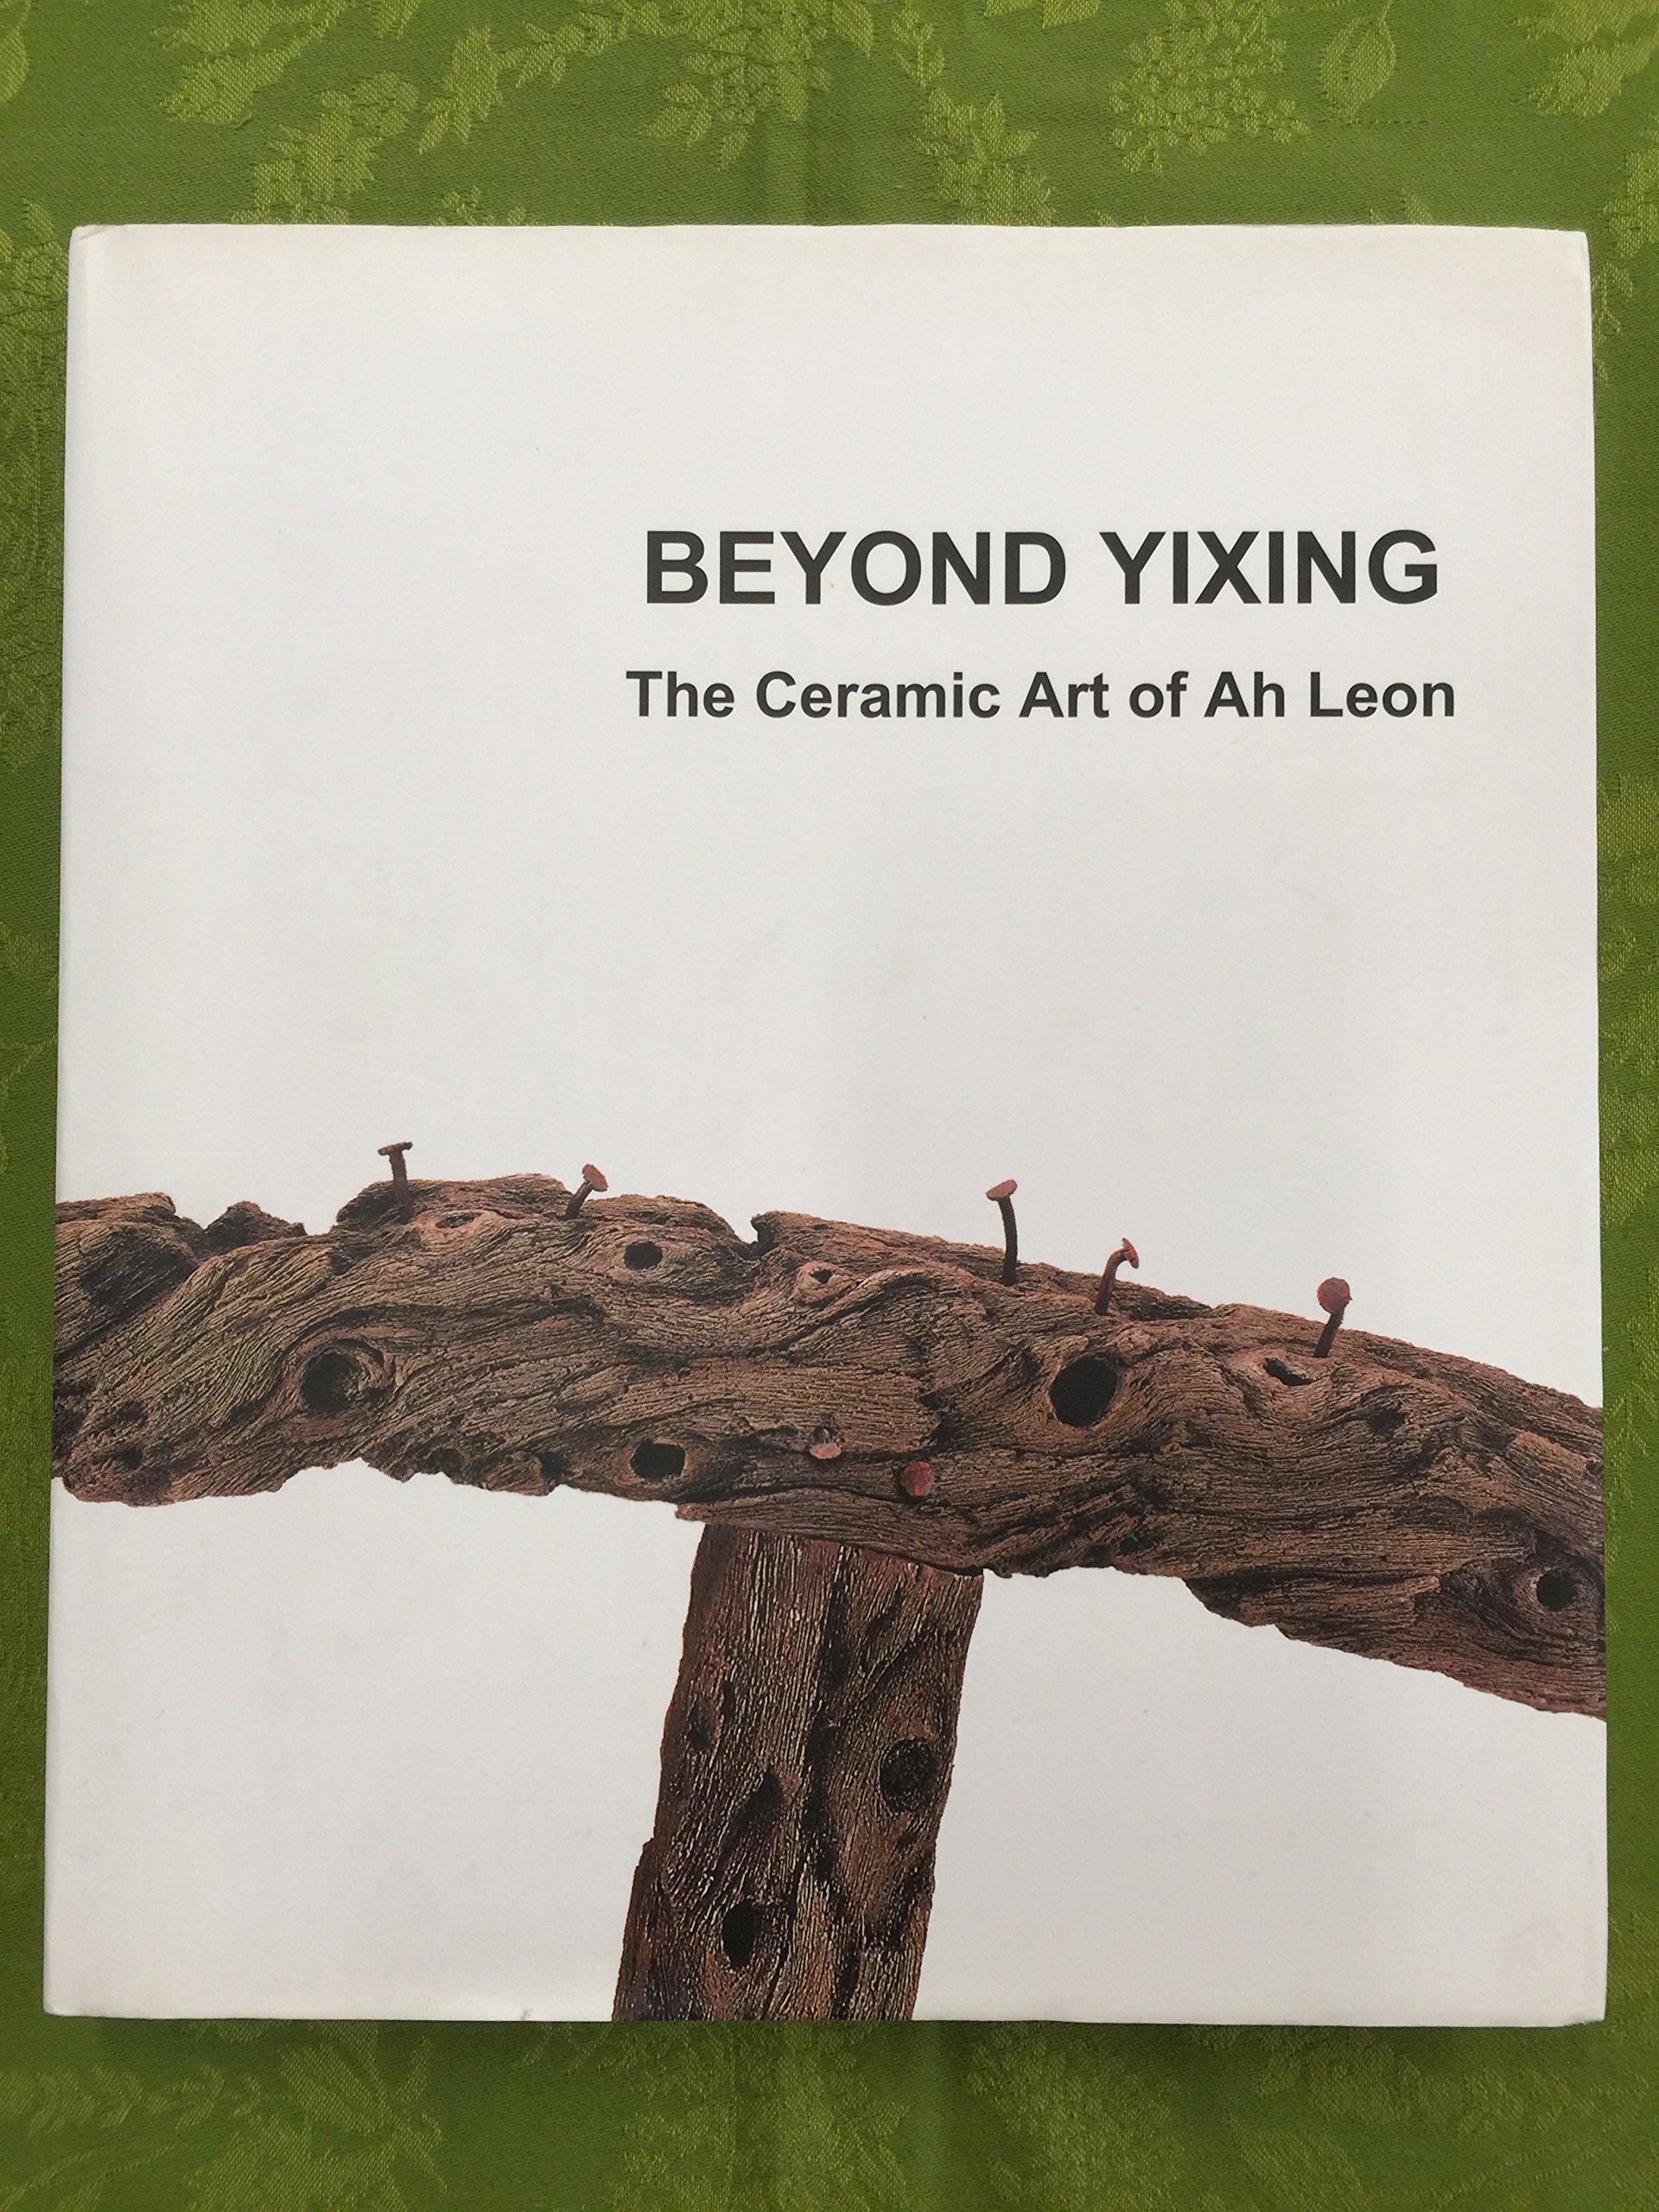 Beyond Yixing: The ceramic art of Ah Leon